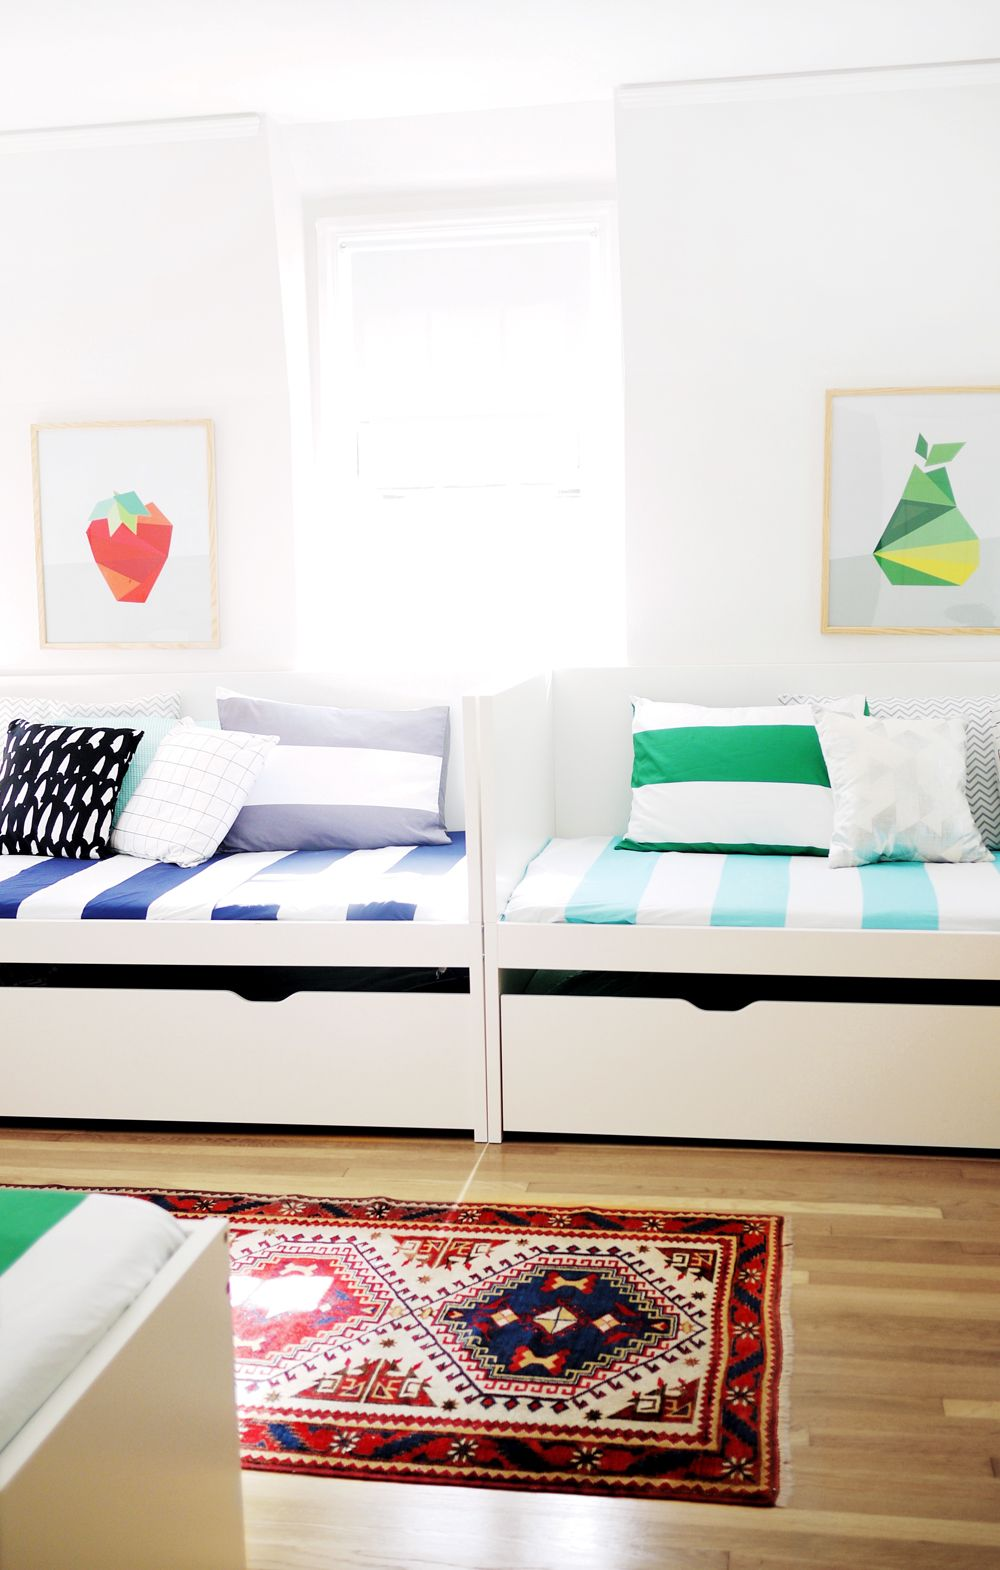 A Shared Bedroom For Seven Grandkids Project Nursery Kid Room Daybed Ikea Kids Bedroom Kid Room Decor